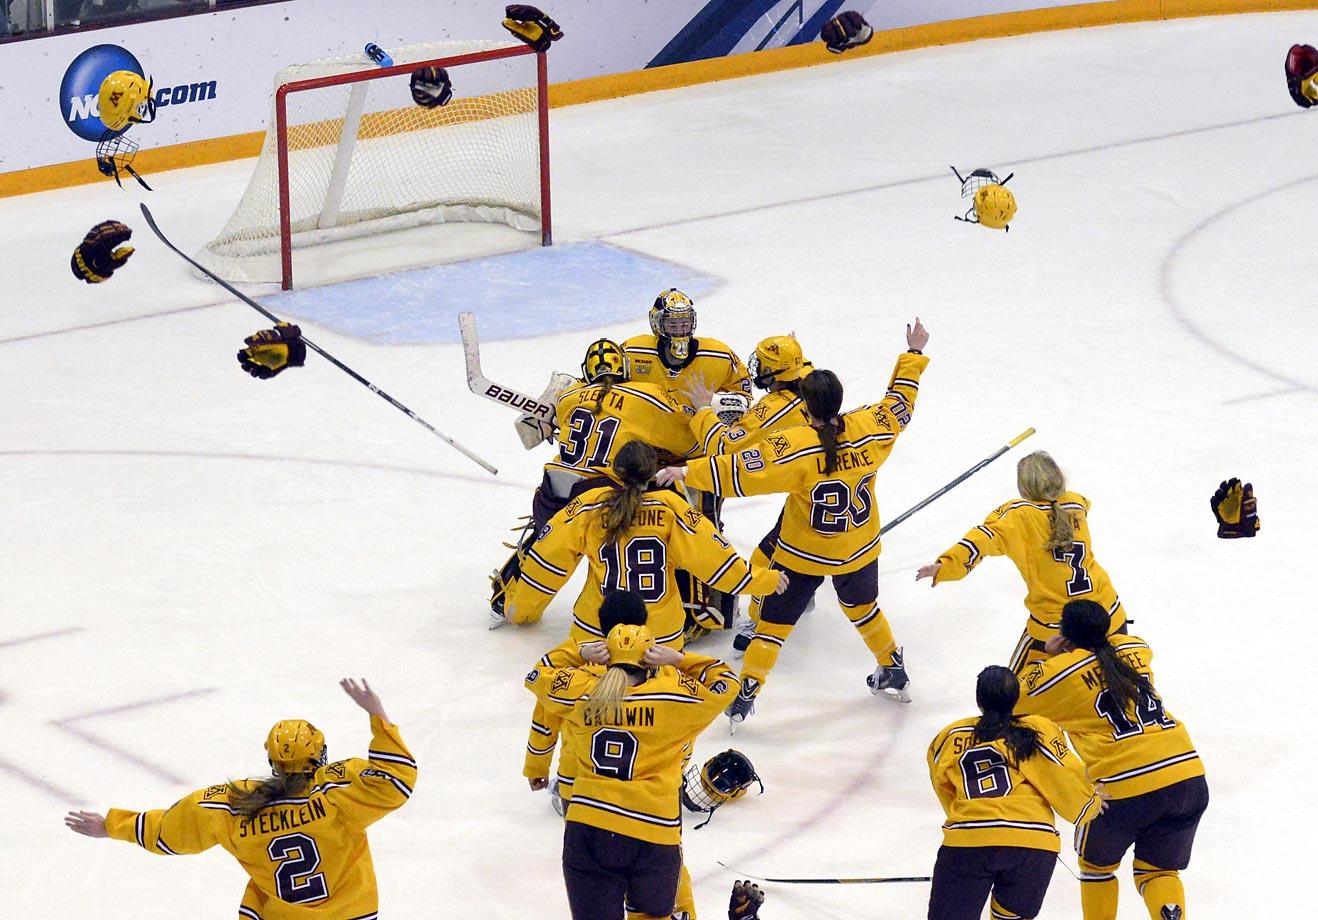 Minnesota players celebrate winning the NCAA Frozen Four championship against Harvard in Minneapolis. Minnesota won 4-1.